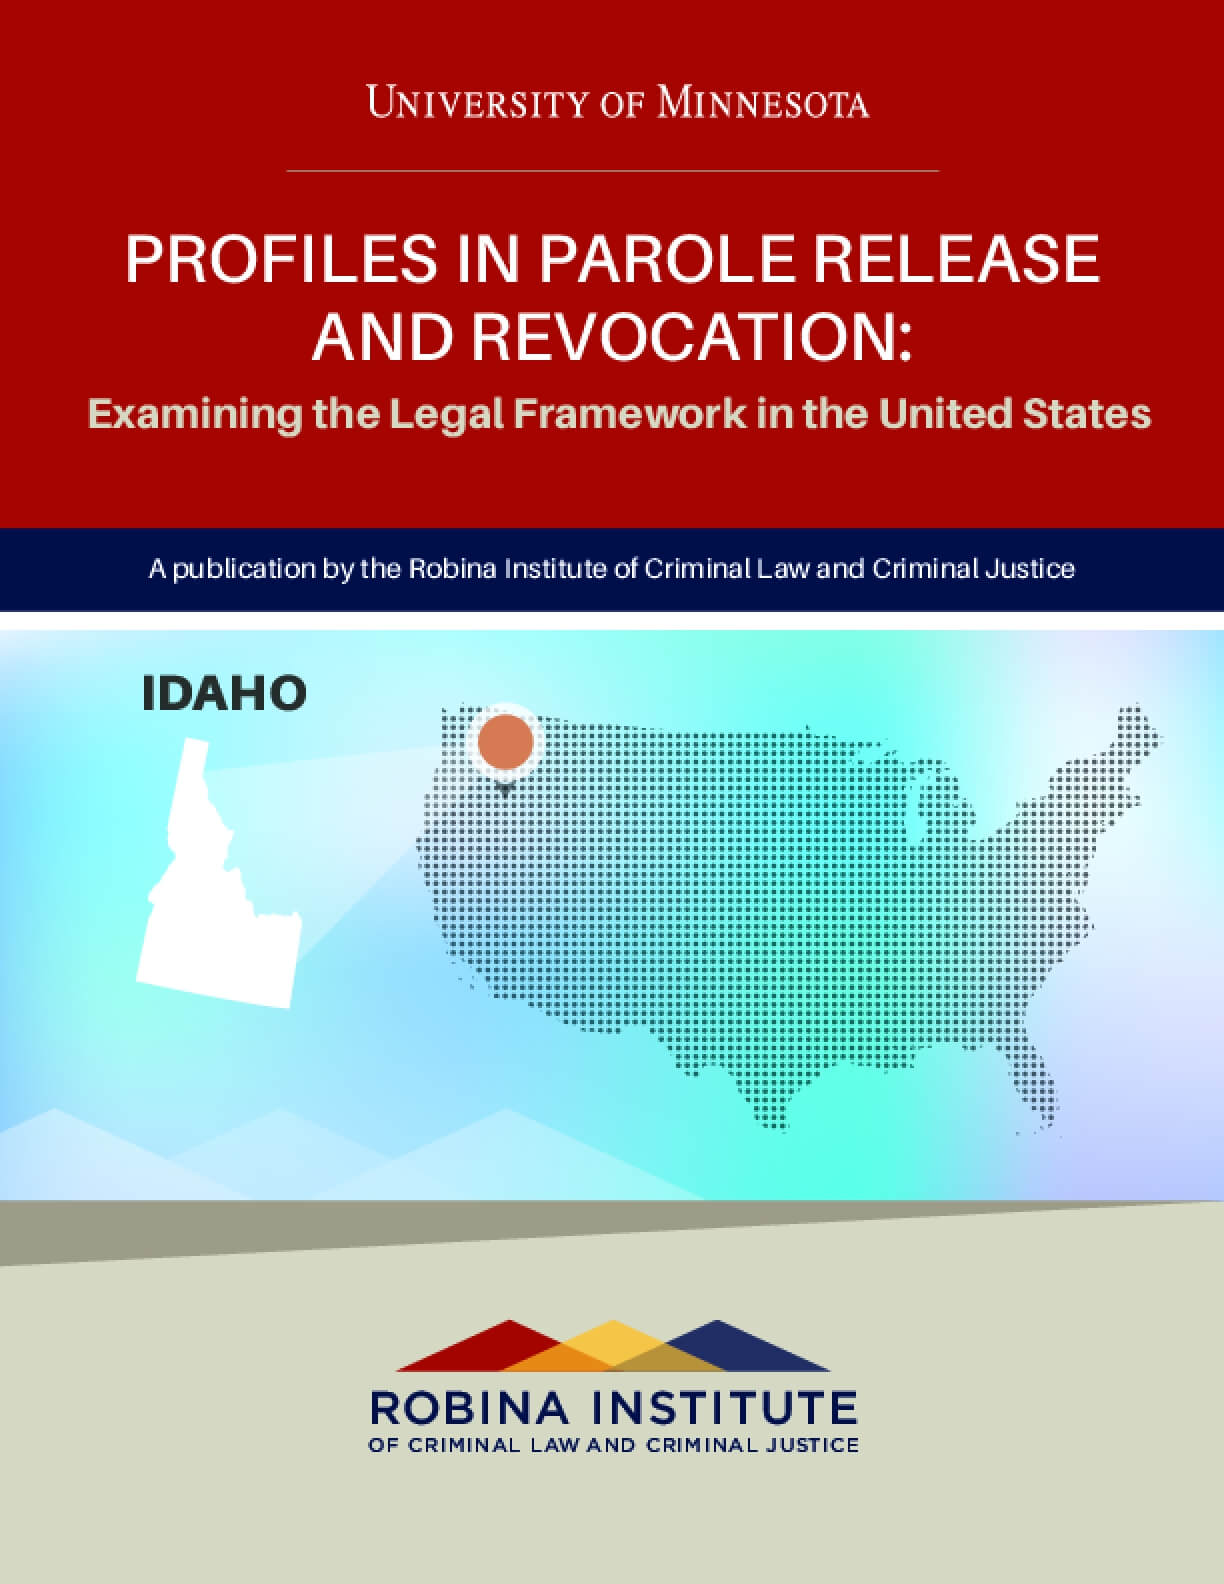 Profiles in Parole Release and Revocation Idaho